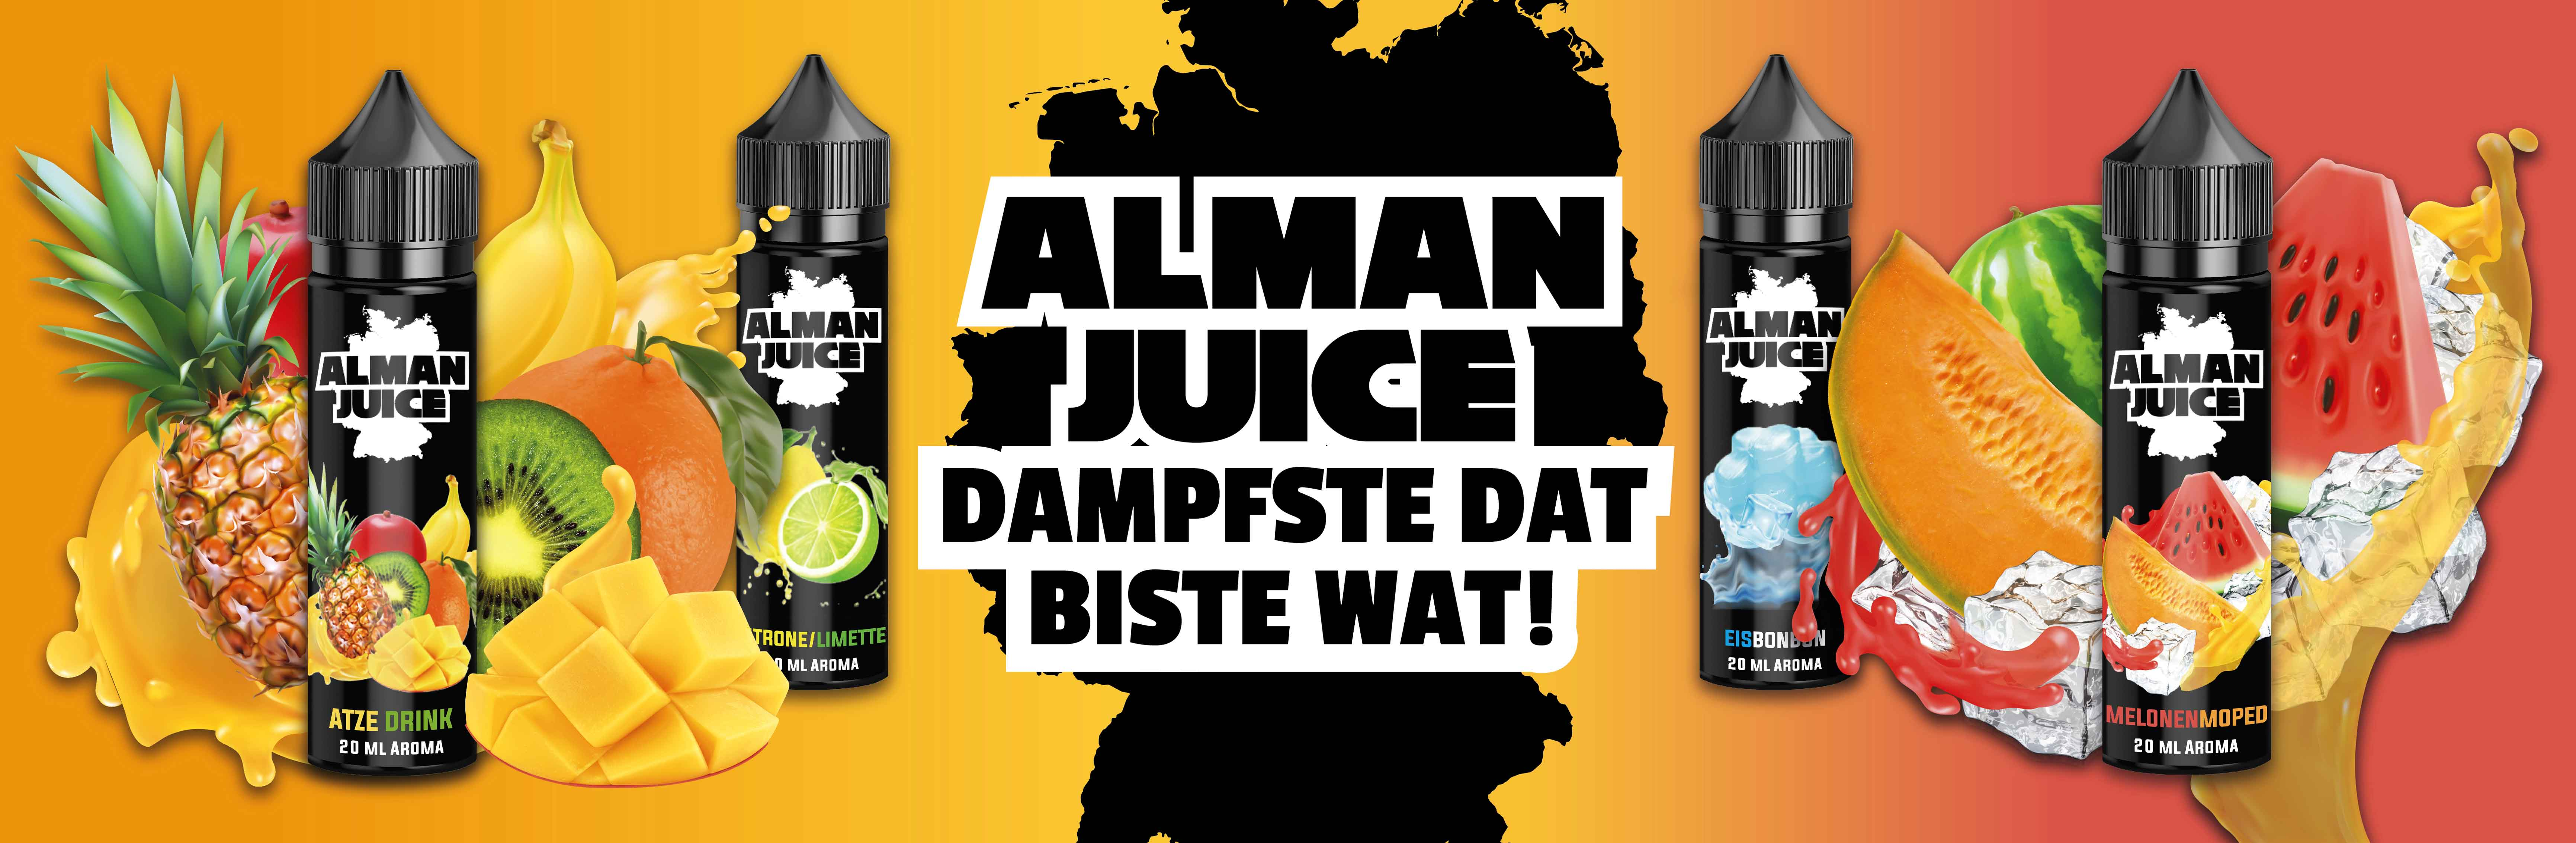 Alman-Juice-Aromen